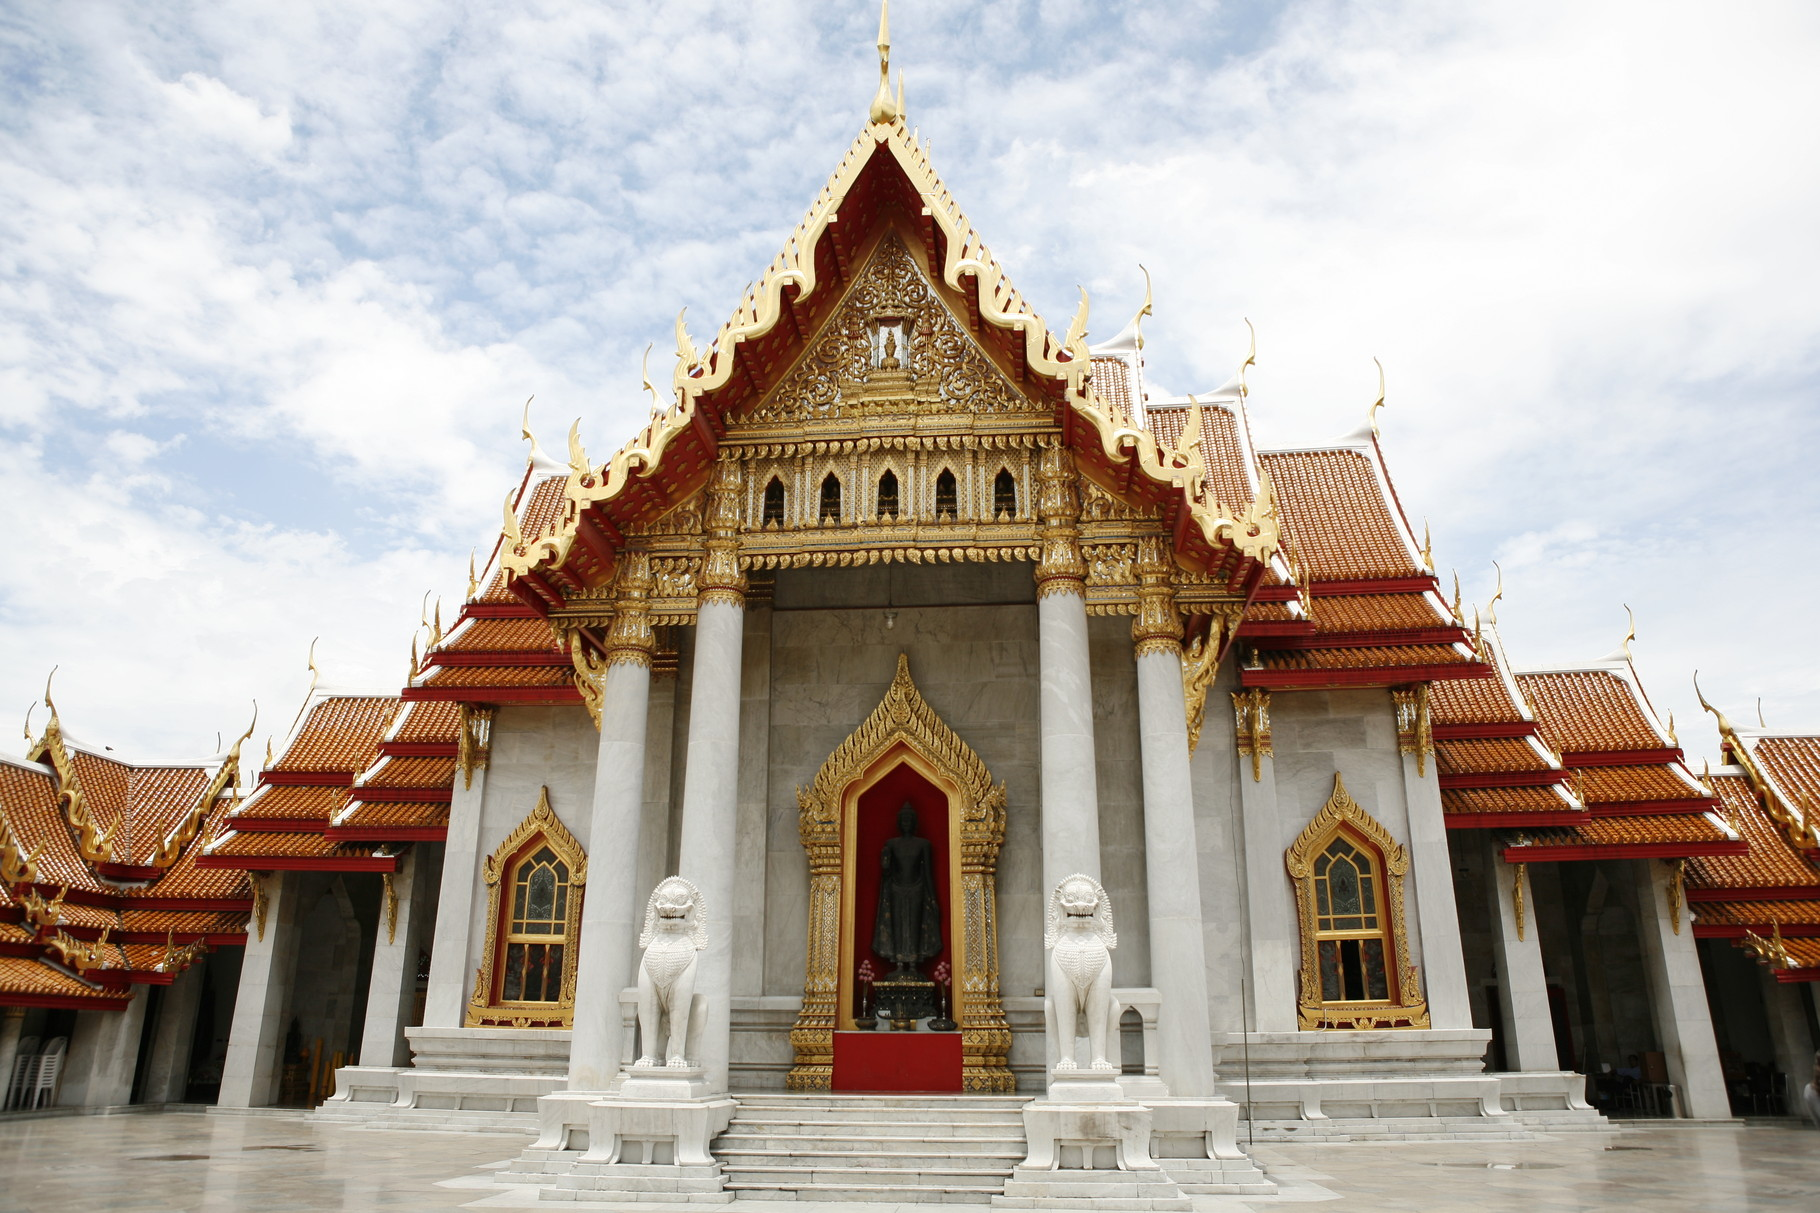 De Wat Benchamabophit tempel in Bangkok, Thailand.